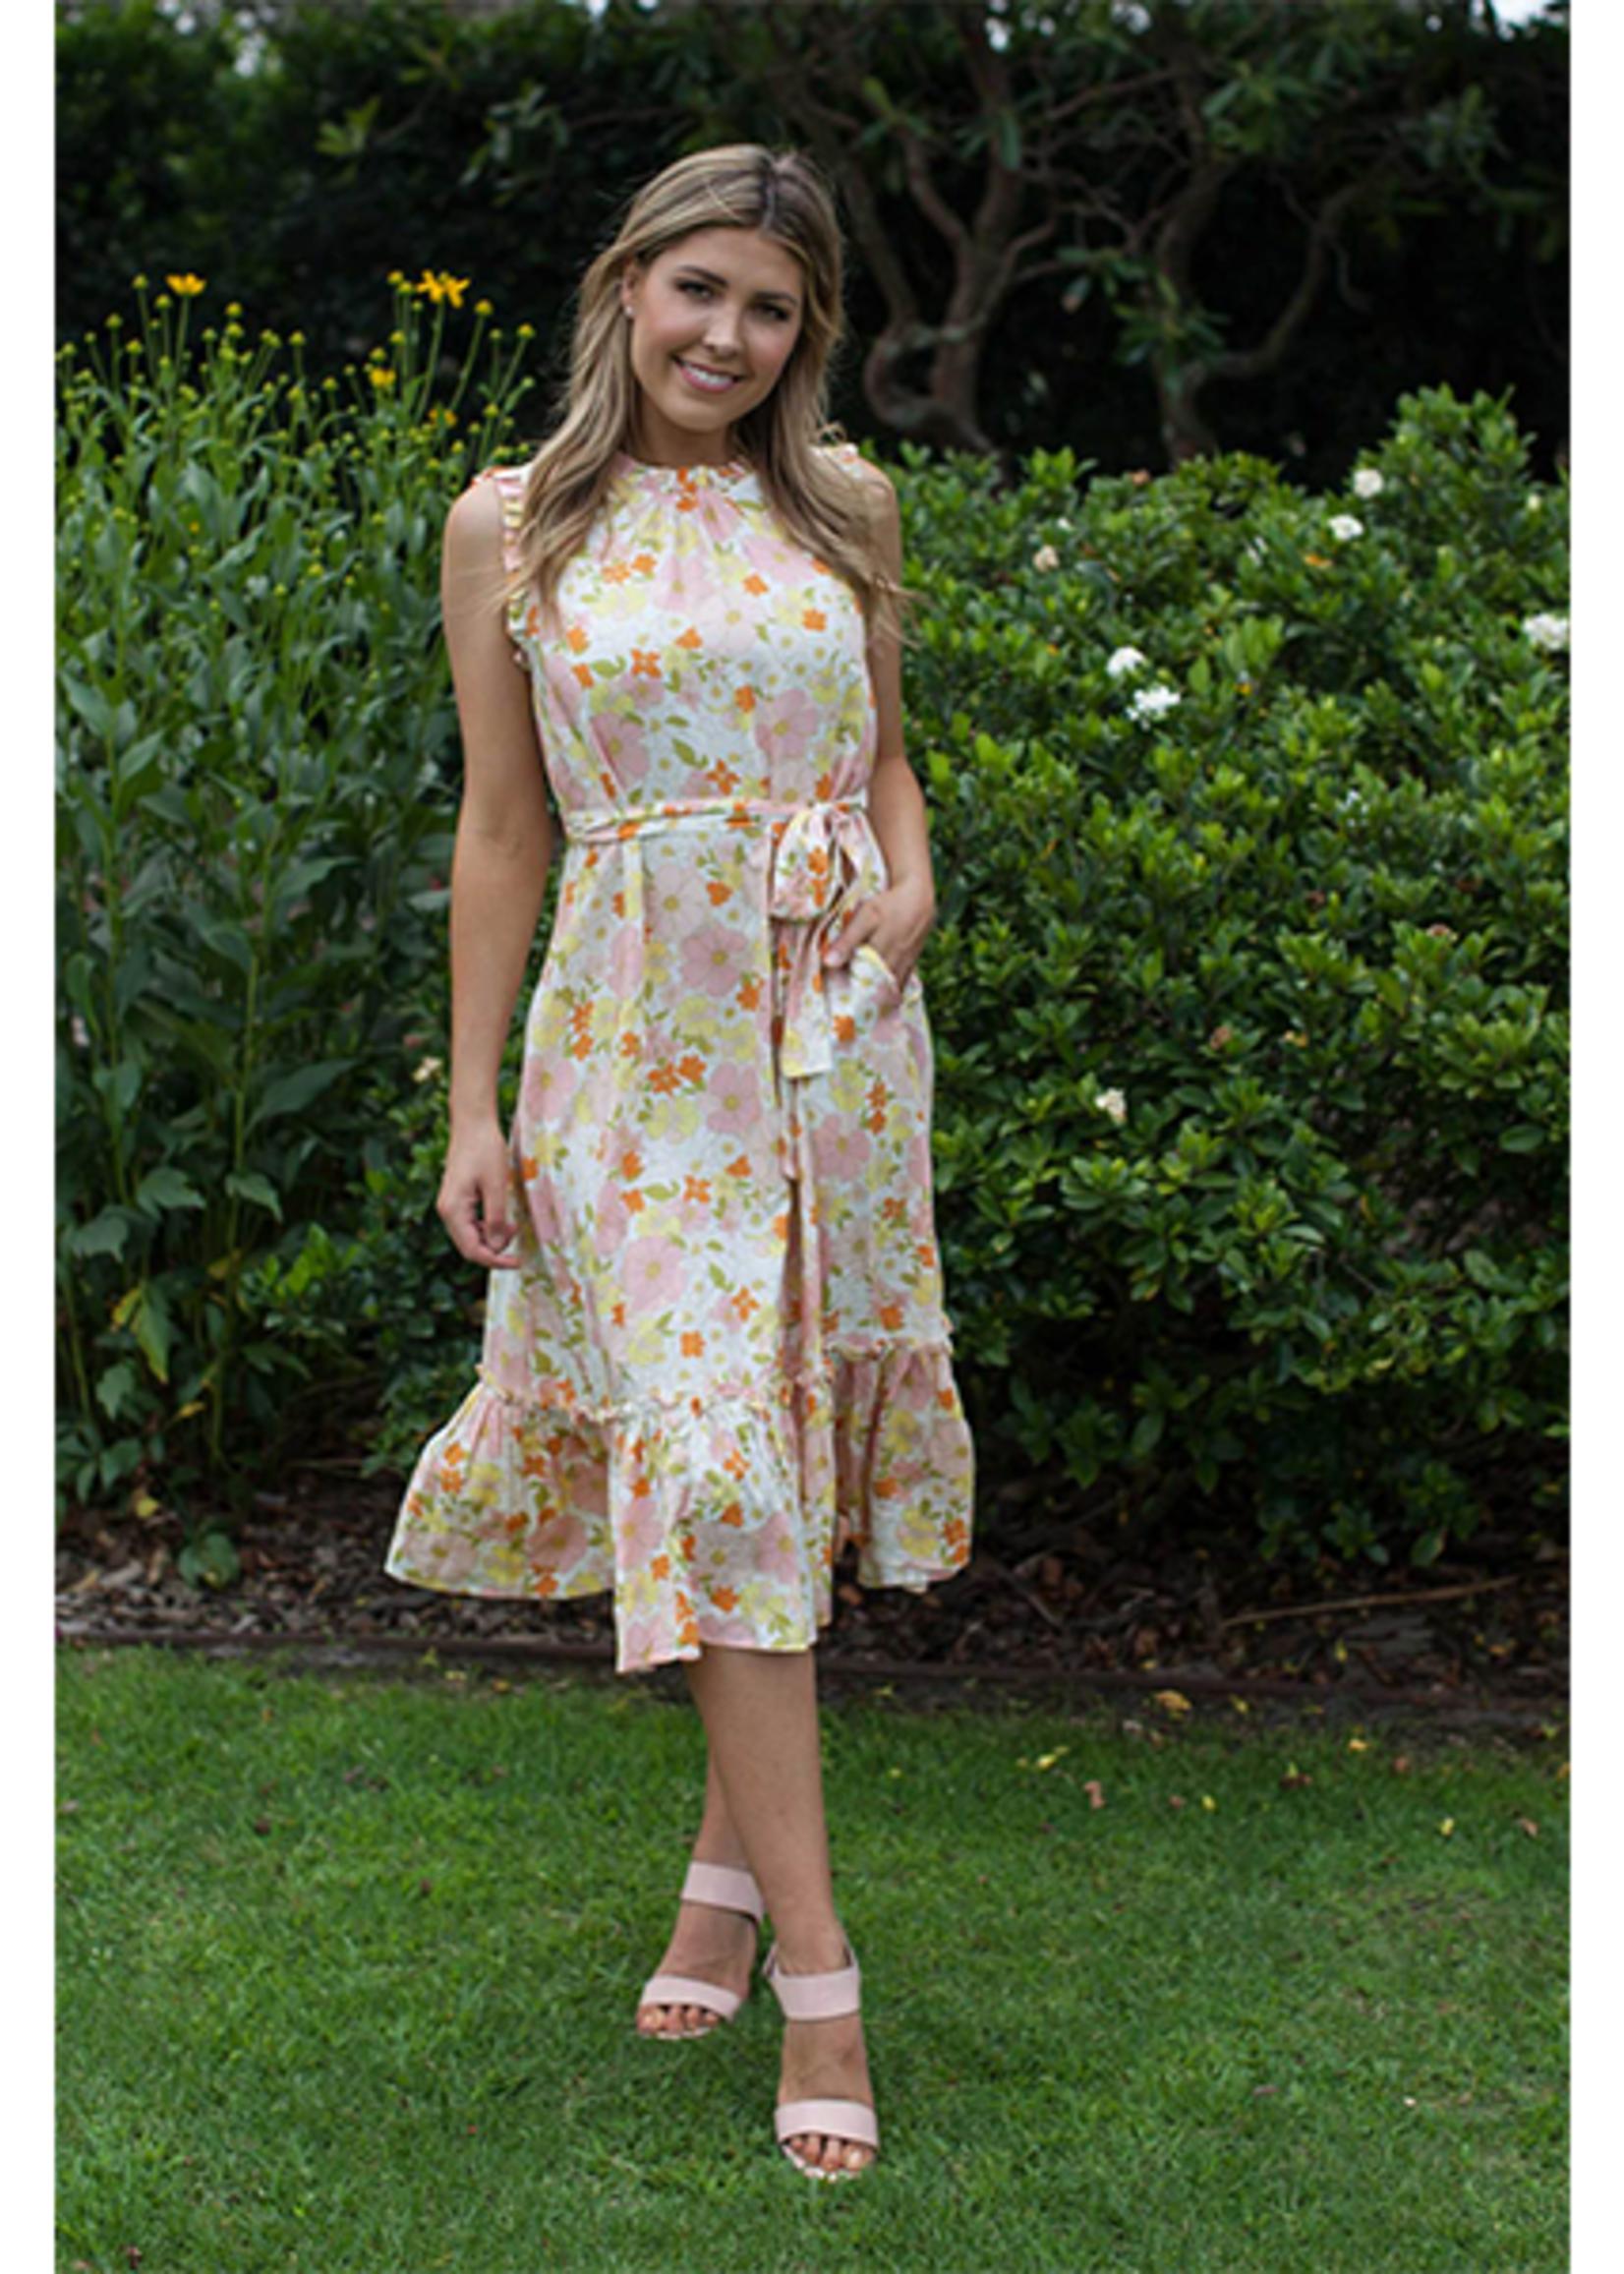 Boho Australia Golden Bloom Midi Dress in White